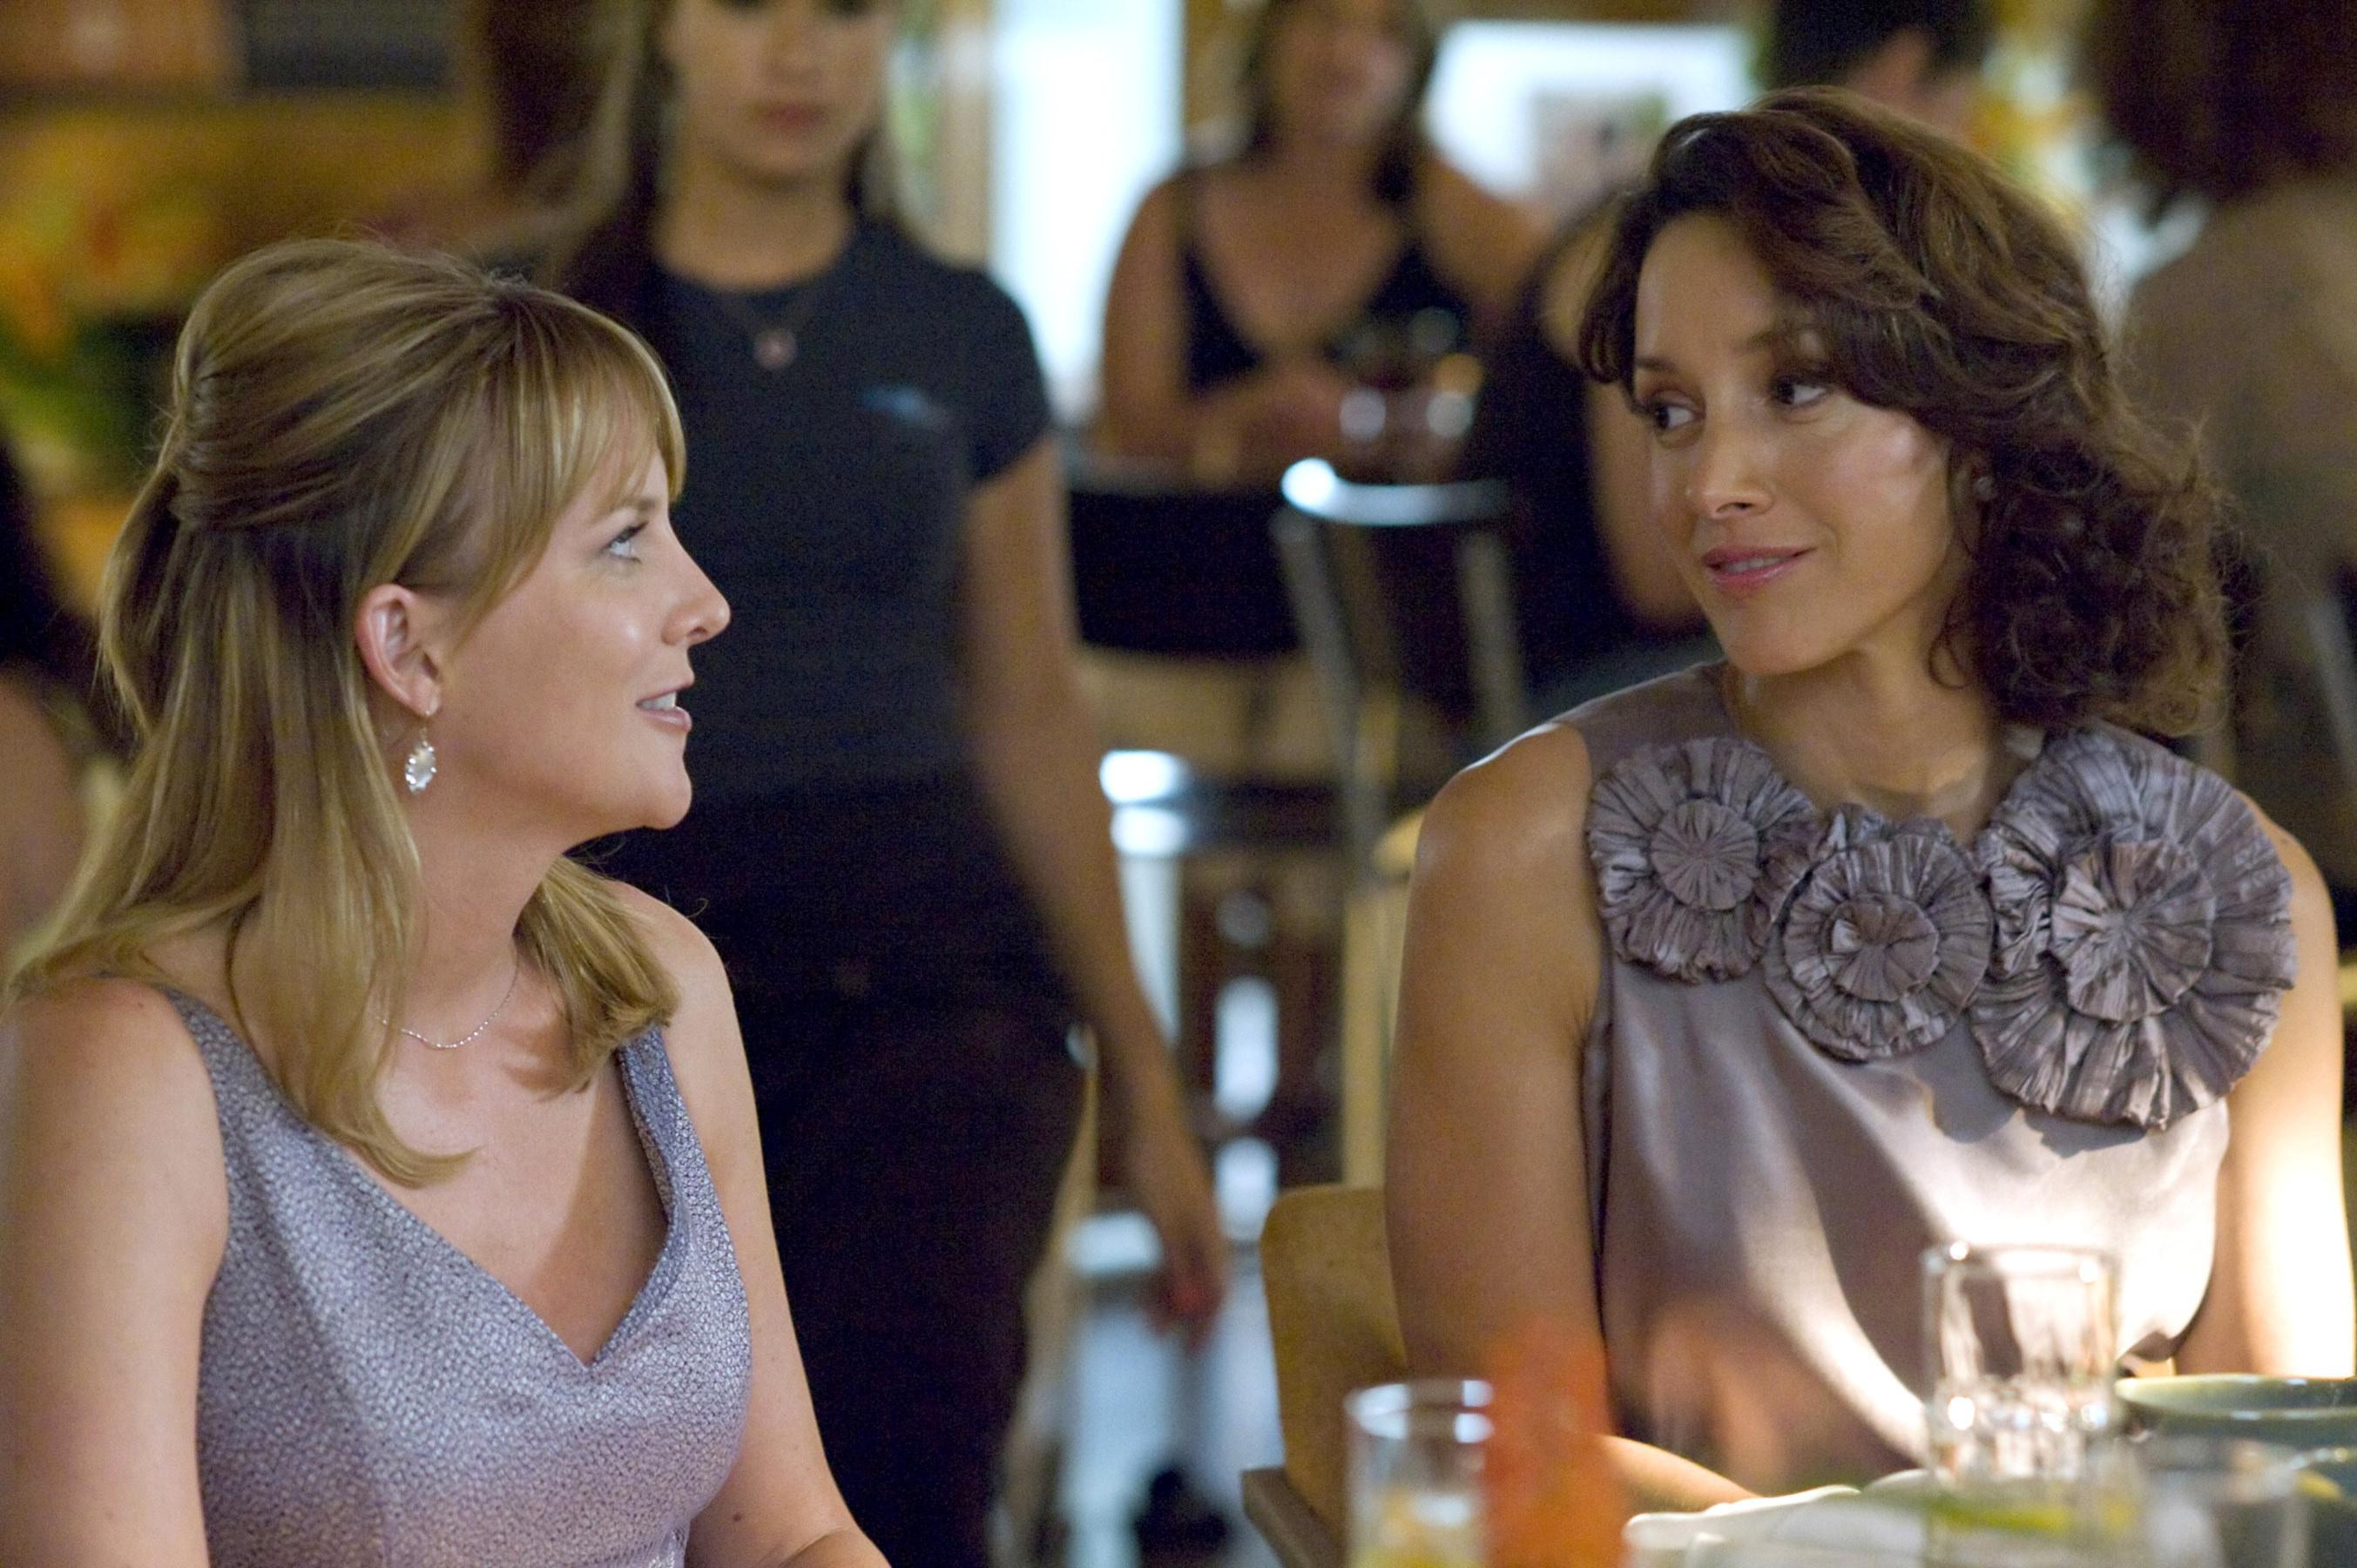 Laurel Holloman and Jennifer Beals sit at a table